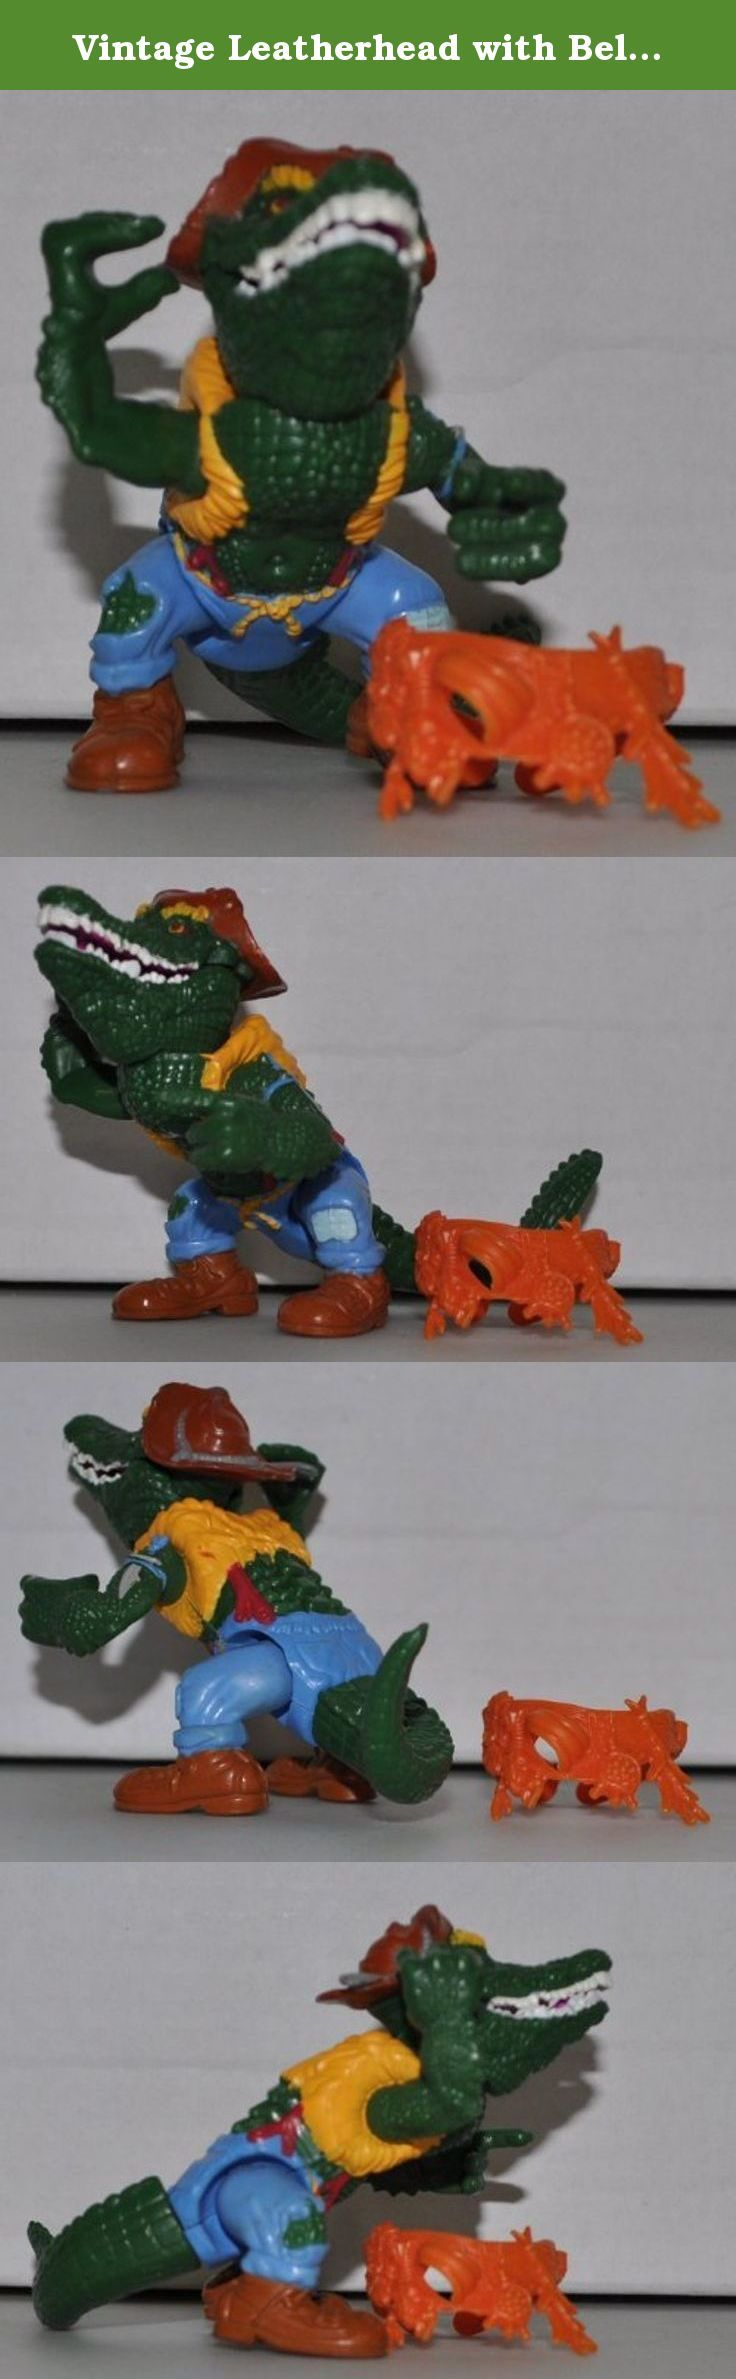 Vintage Leatherhead with Belt (1989) - Action Figure - Playmates - TMNT - Teenage Mutant Ninja Turtles Collectible Figure - Loose Out of Package & Print (OOP). Used, Tmnt Leatherhead action figure, No box no weapons! Figure+Belt only ok.